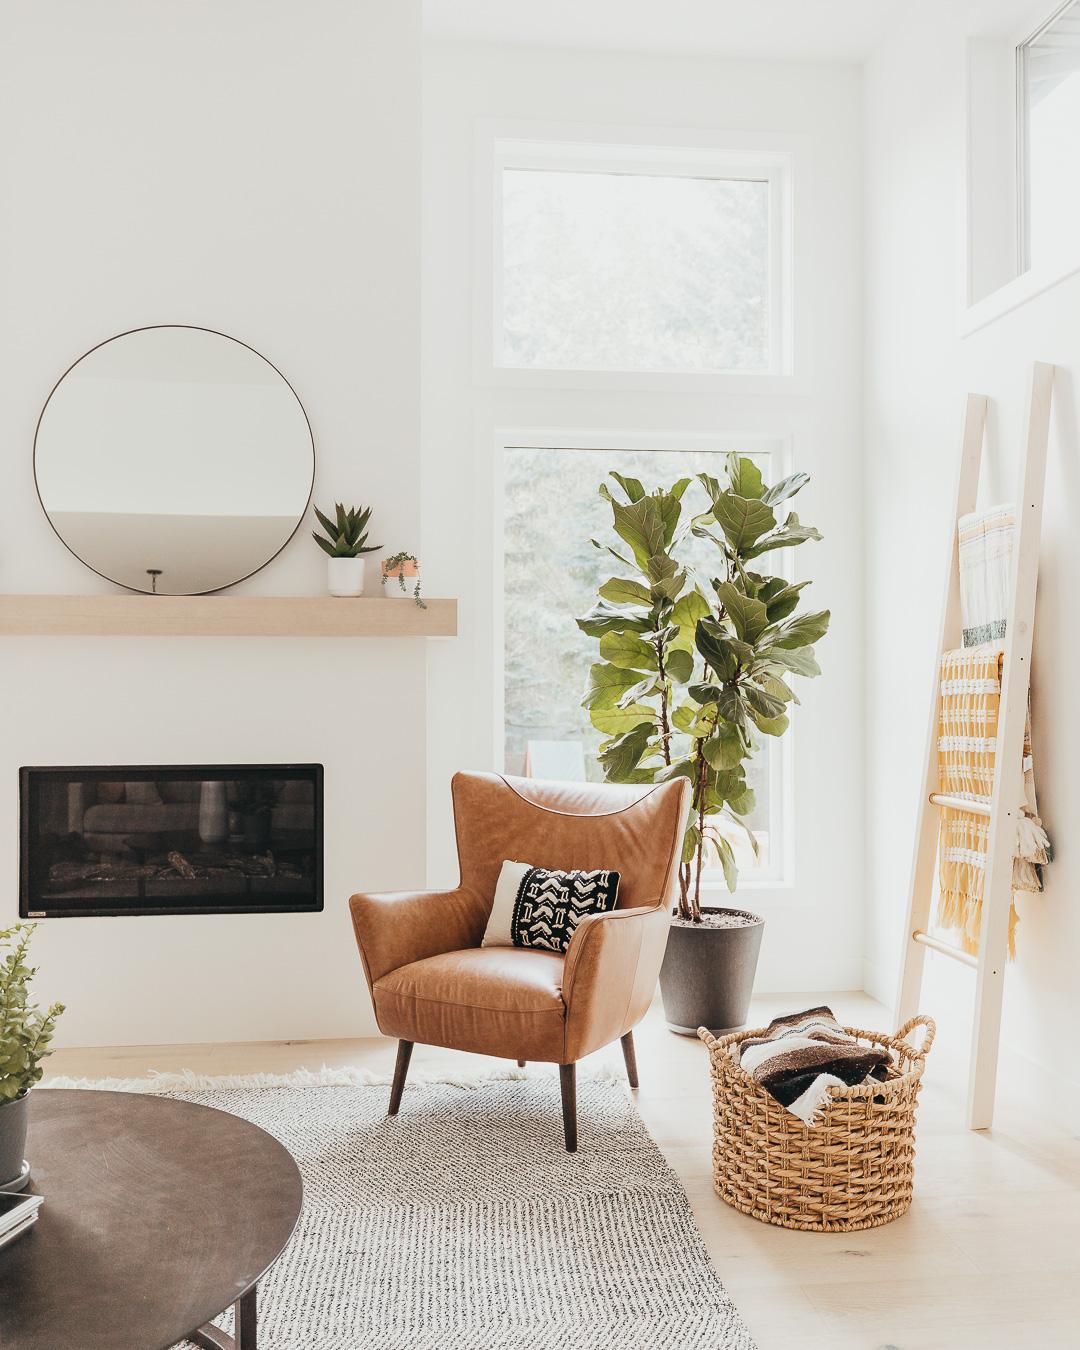 8 Important Aspects Of A Scandinavian Living Room In 2020 Living Room Scandinavian Scandinavian Interior Living Room Interior Design Living Room Small #scandinavian #interior #design #living #room